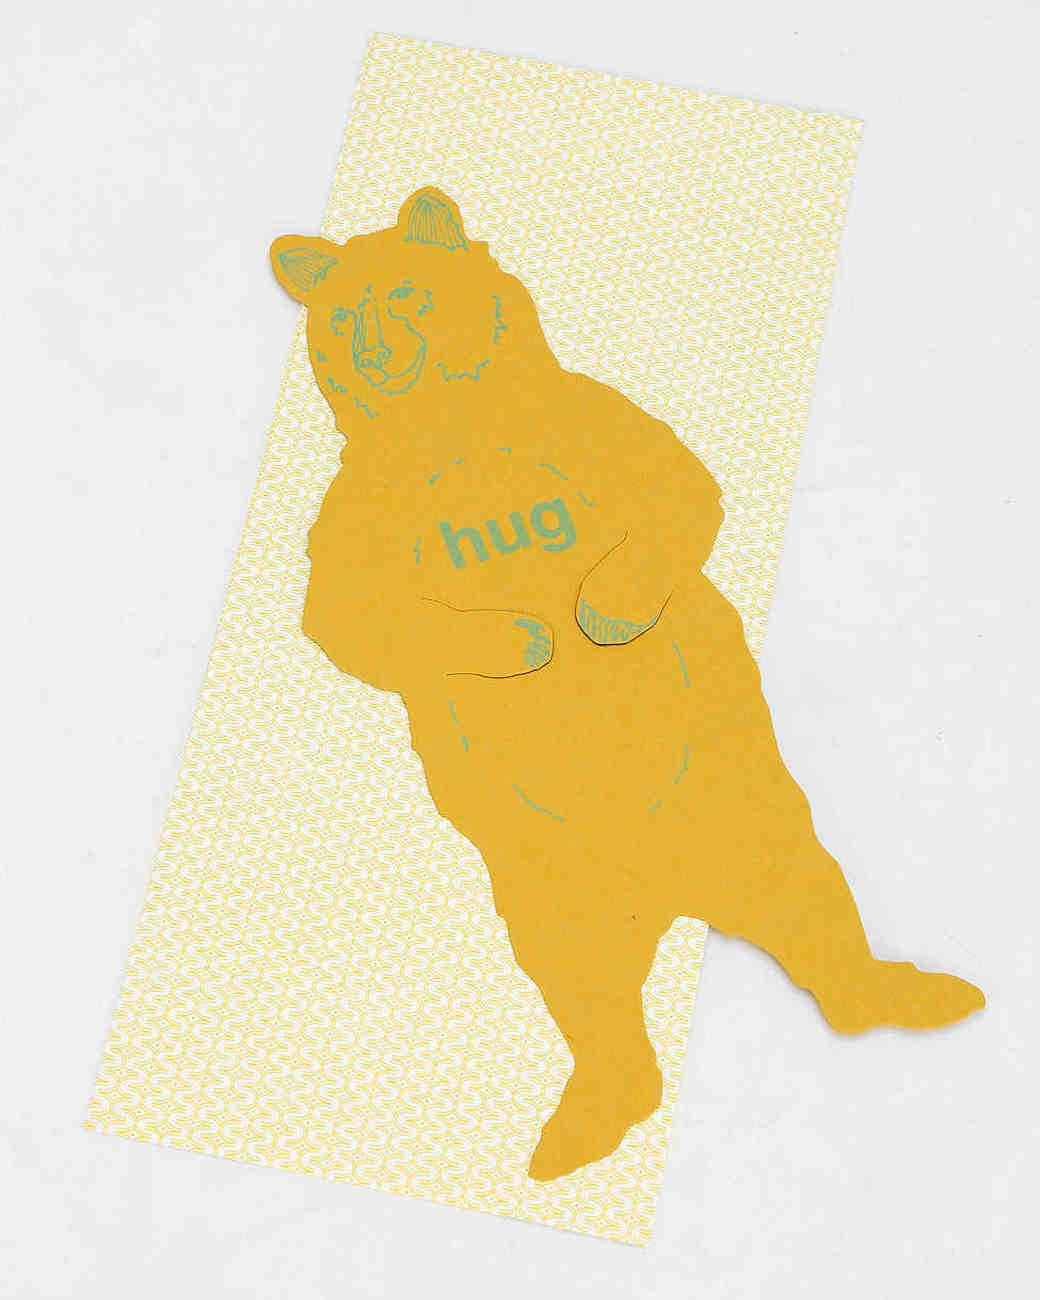 holiday-card-blackbird-letterpress-grizzly-bear-1215.jpg